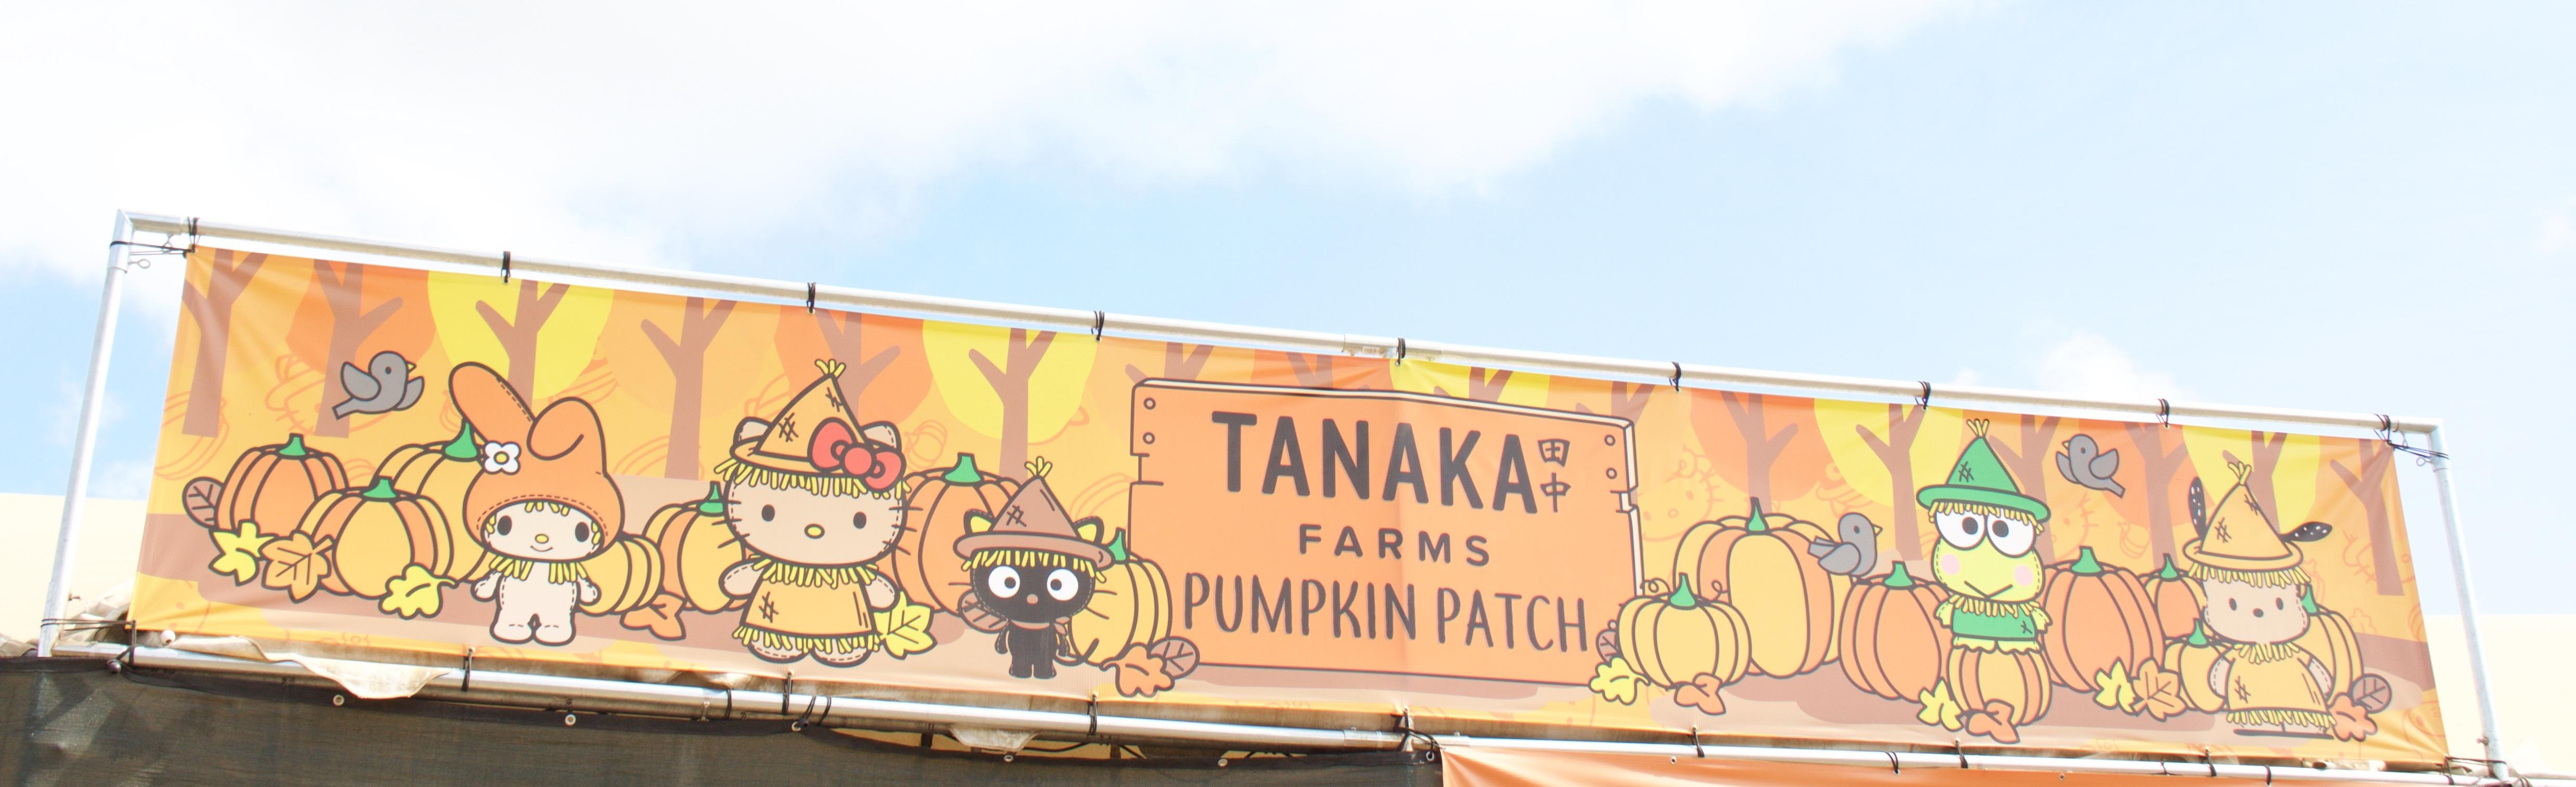 tanaka farms 2017 pumpkin patch